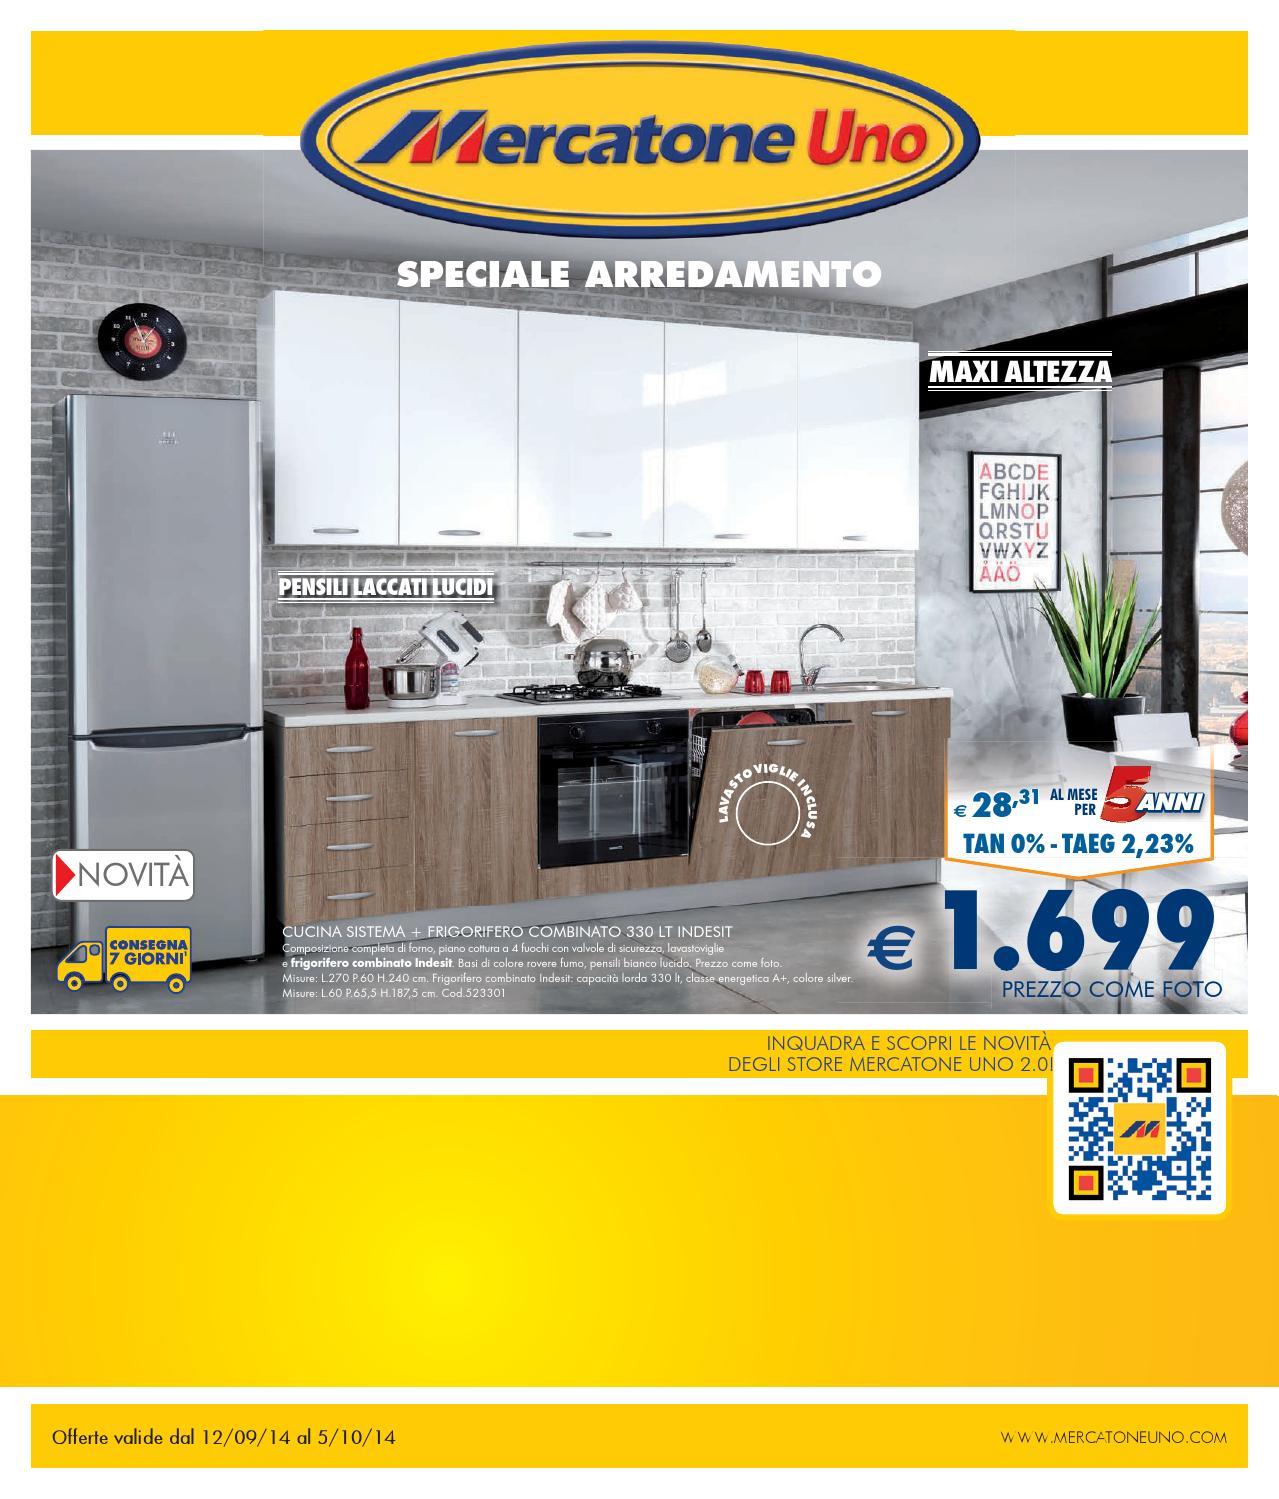 Mercatone uno 5 anni by Mobilpro - issuu